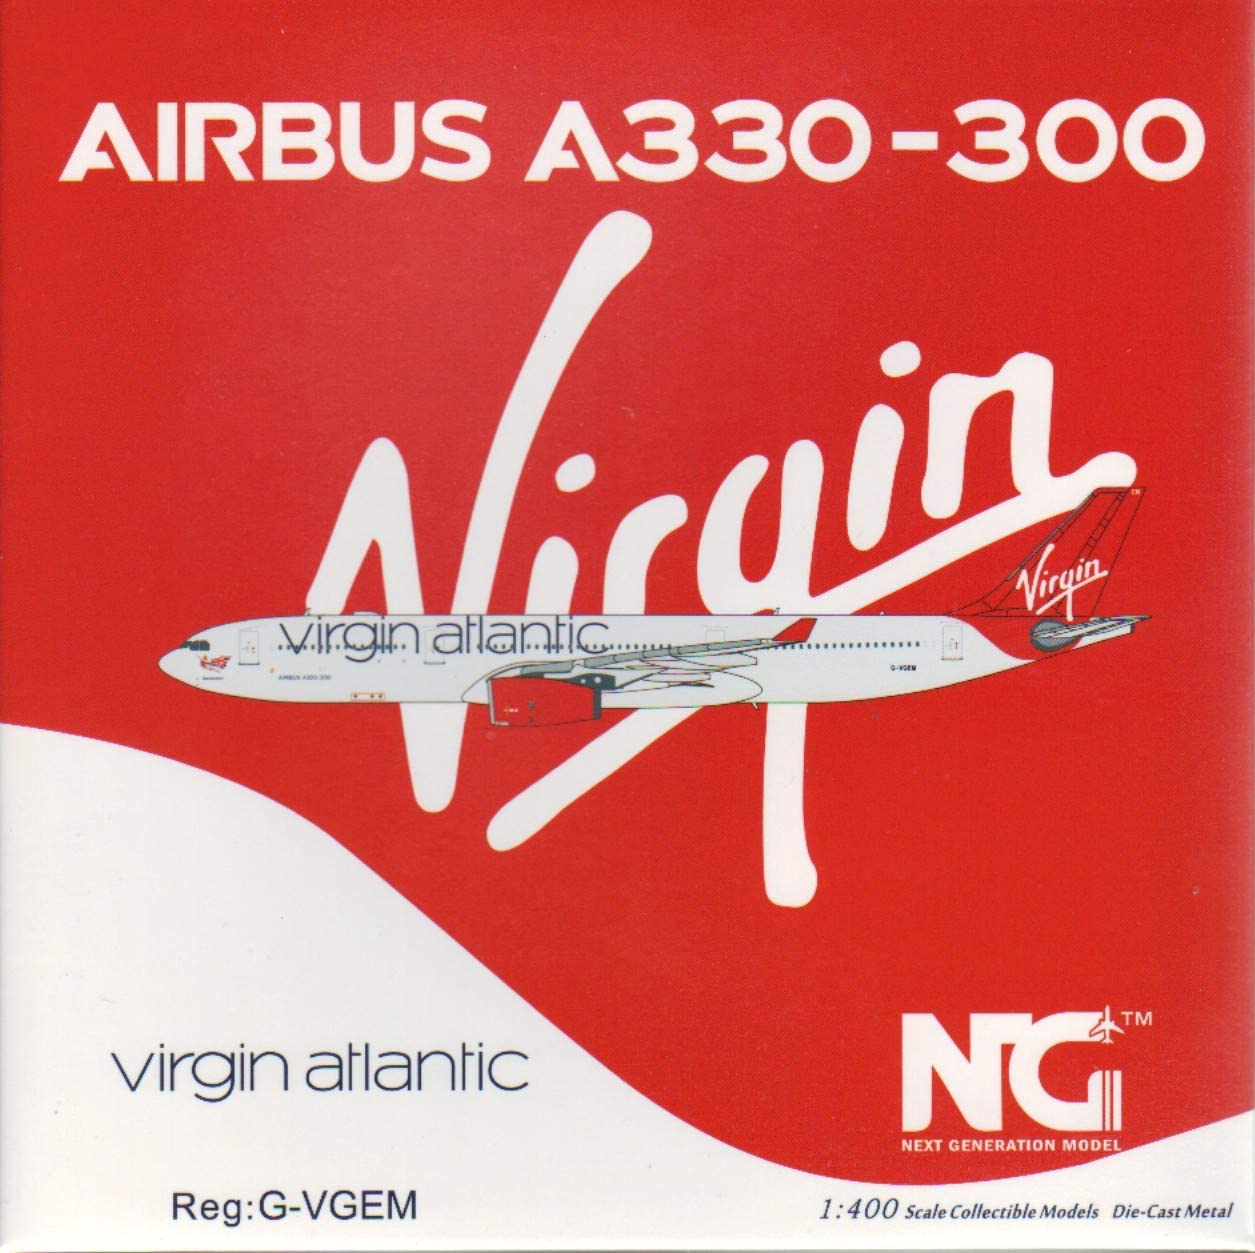 NG Model NGM62007 1:400 Virgin Atlantic Airways Airbus A330-300 Reg #G-VGEM pre-Painted//pre-Built